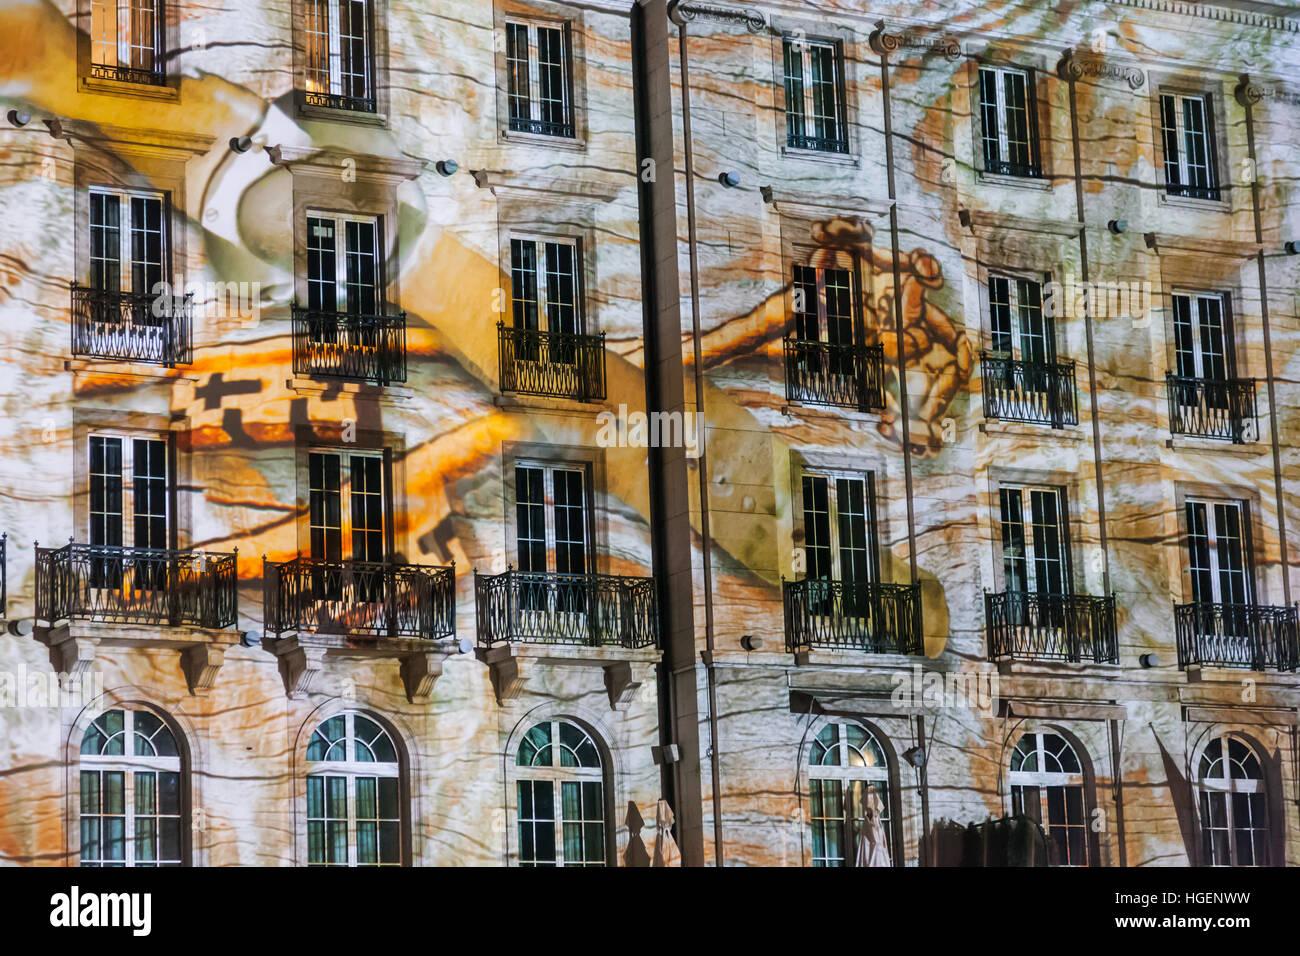 Geneva Hotel Stockfotos & Geneva Hotel Bilder - Alamy